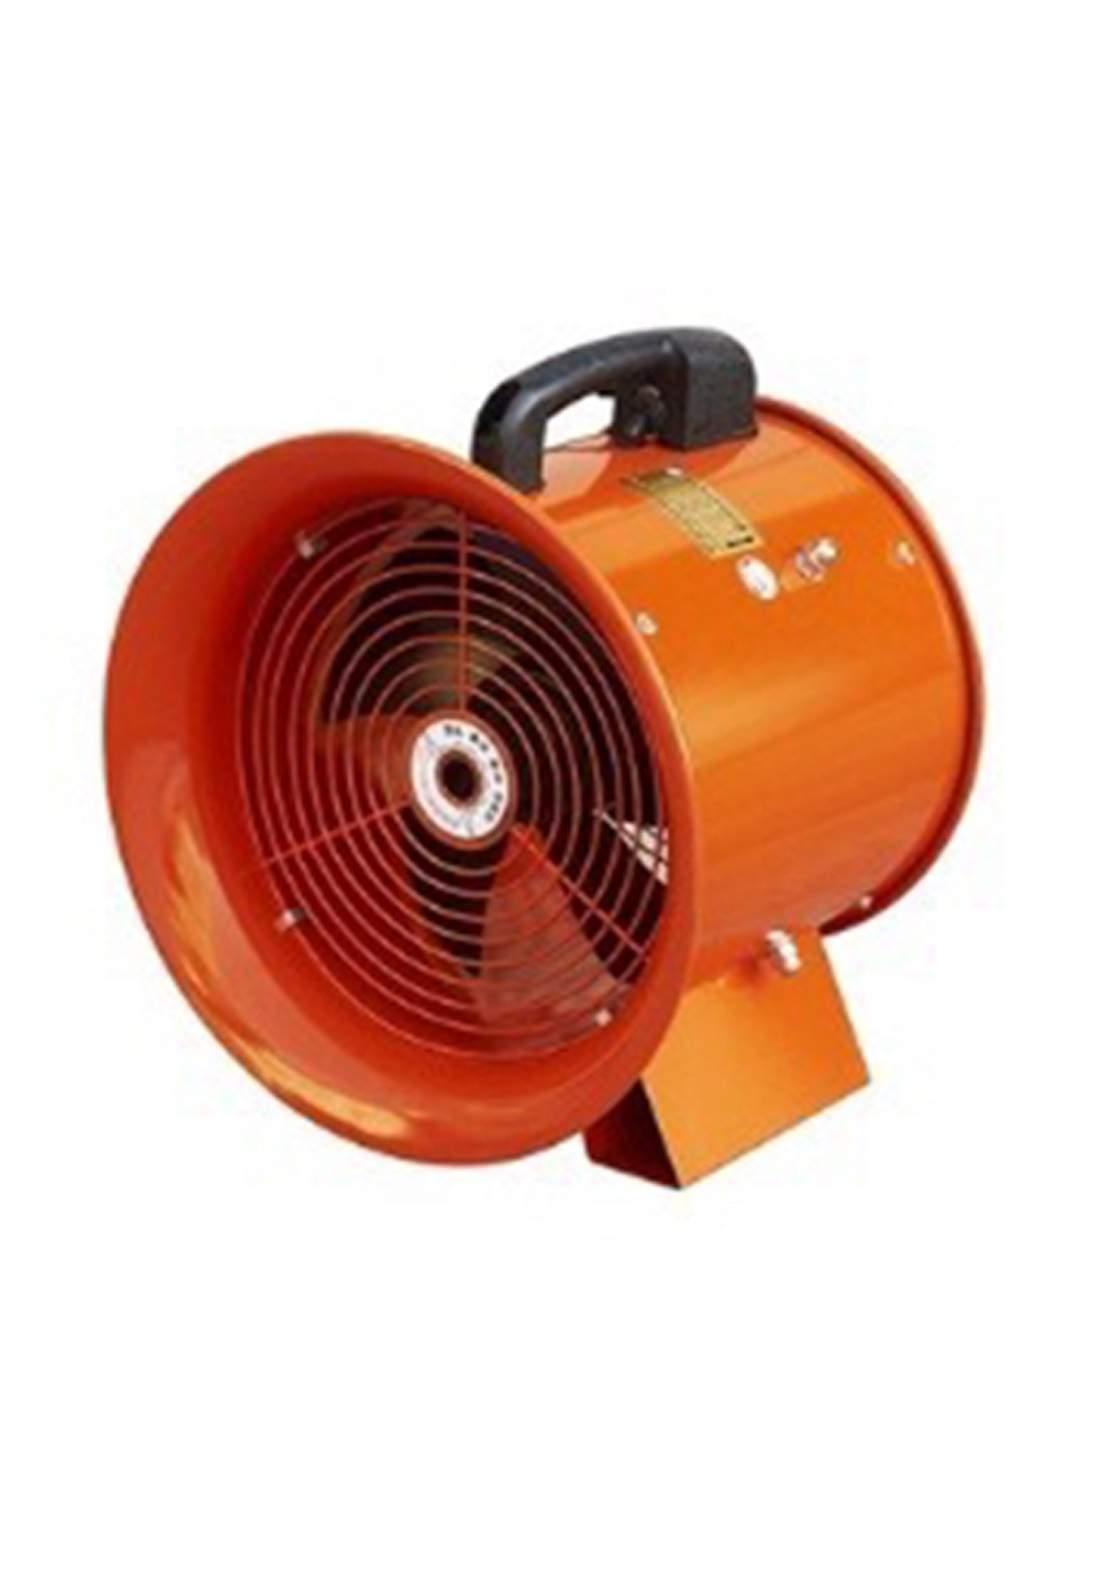 Subul AlHurra Ventilator Blower 10 inch مفرغة هواء